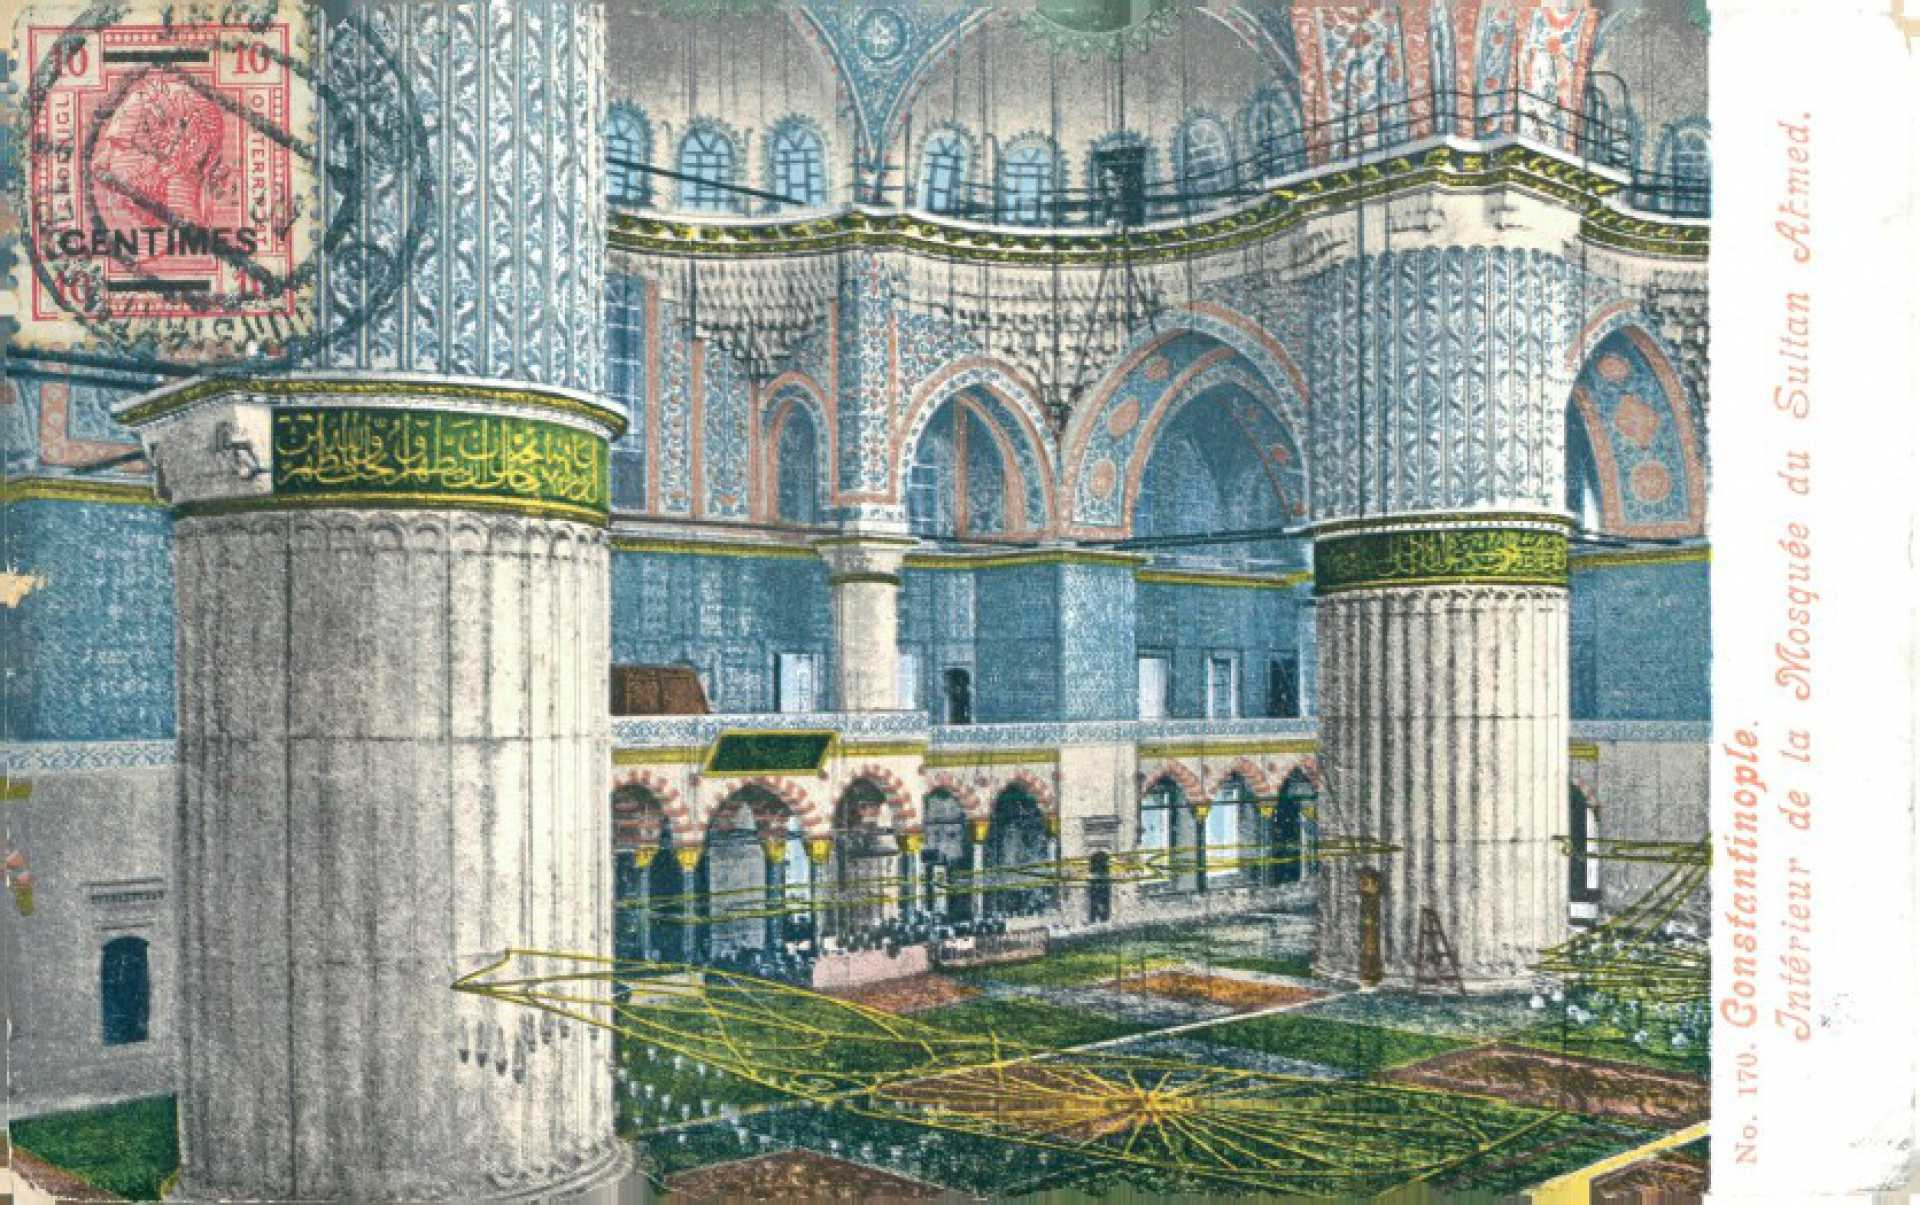 İnterieur de la Mosquee du Sultan Ahmed.